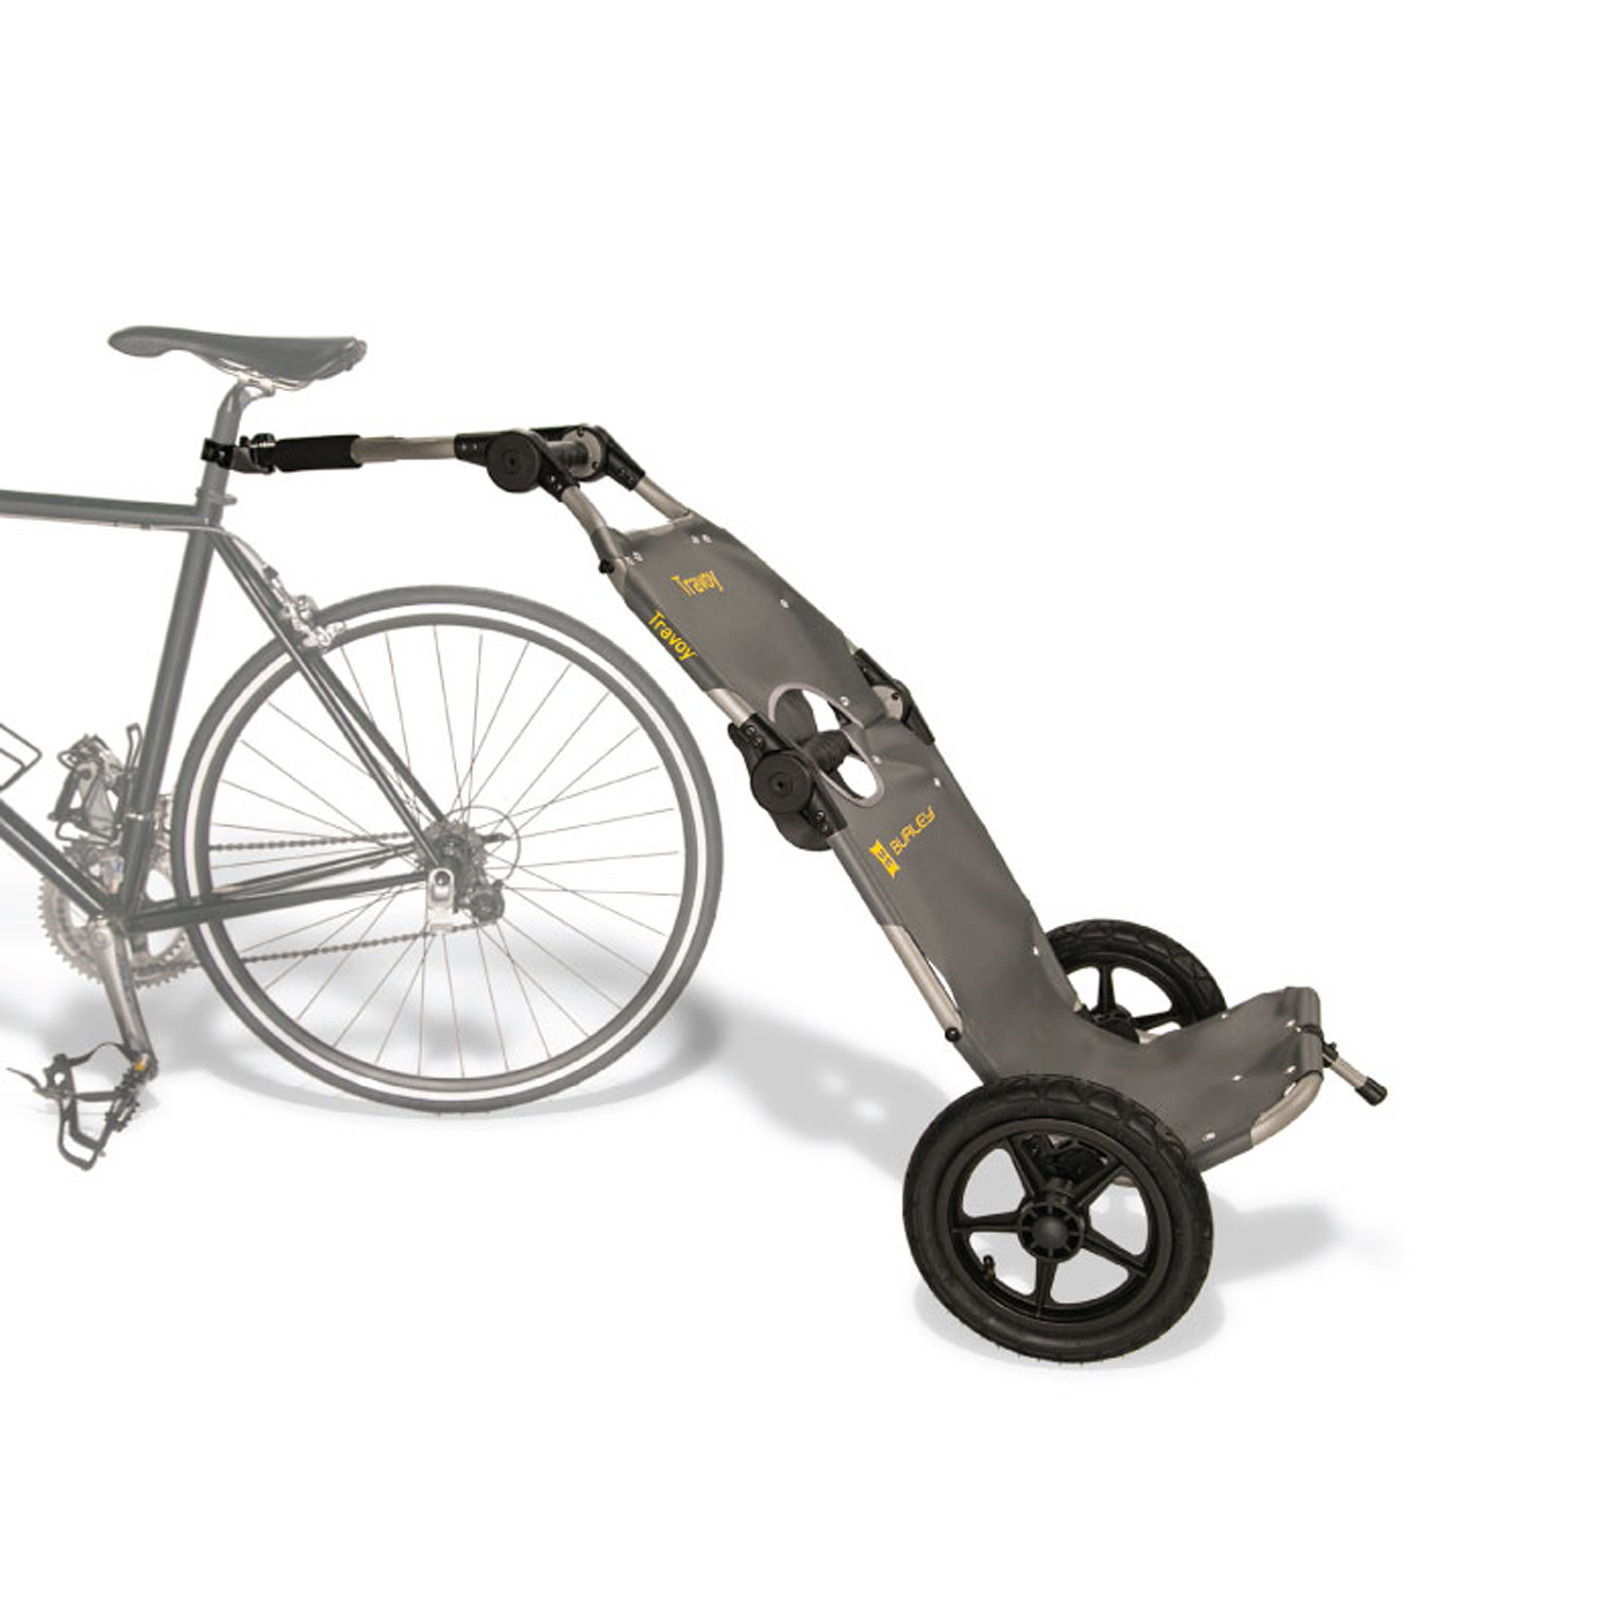 einkaufstrolley fahrrad lastenanh nger burley travoy. Black Bedroom Furniture Sets. Home Design Ideas